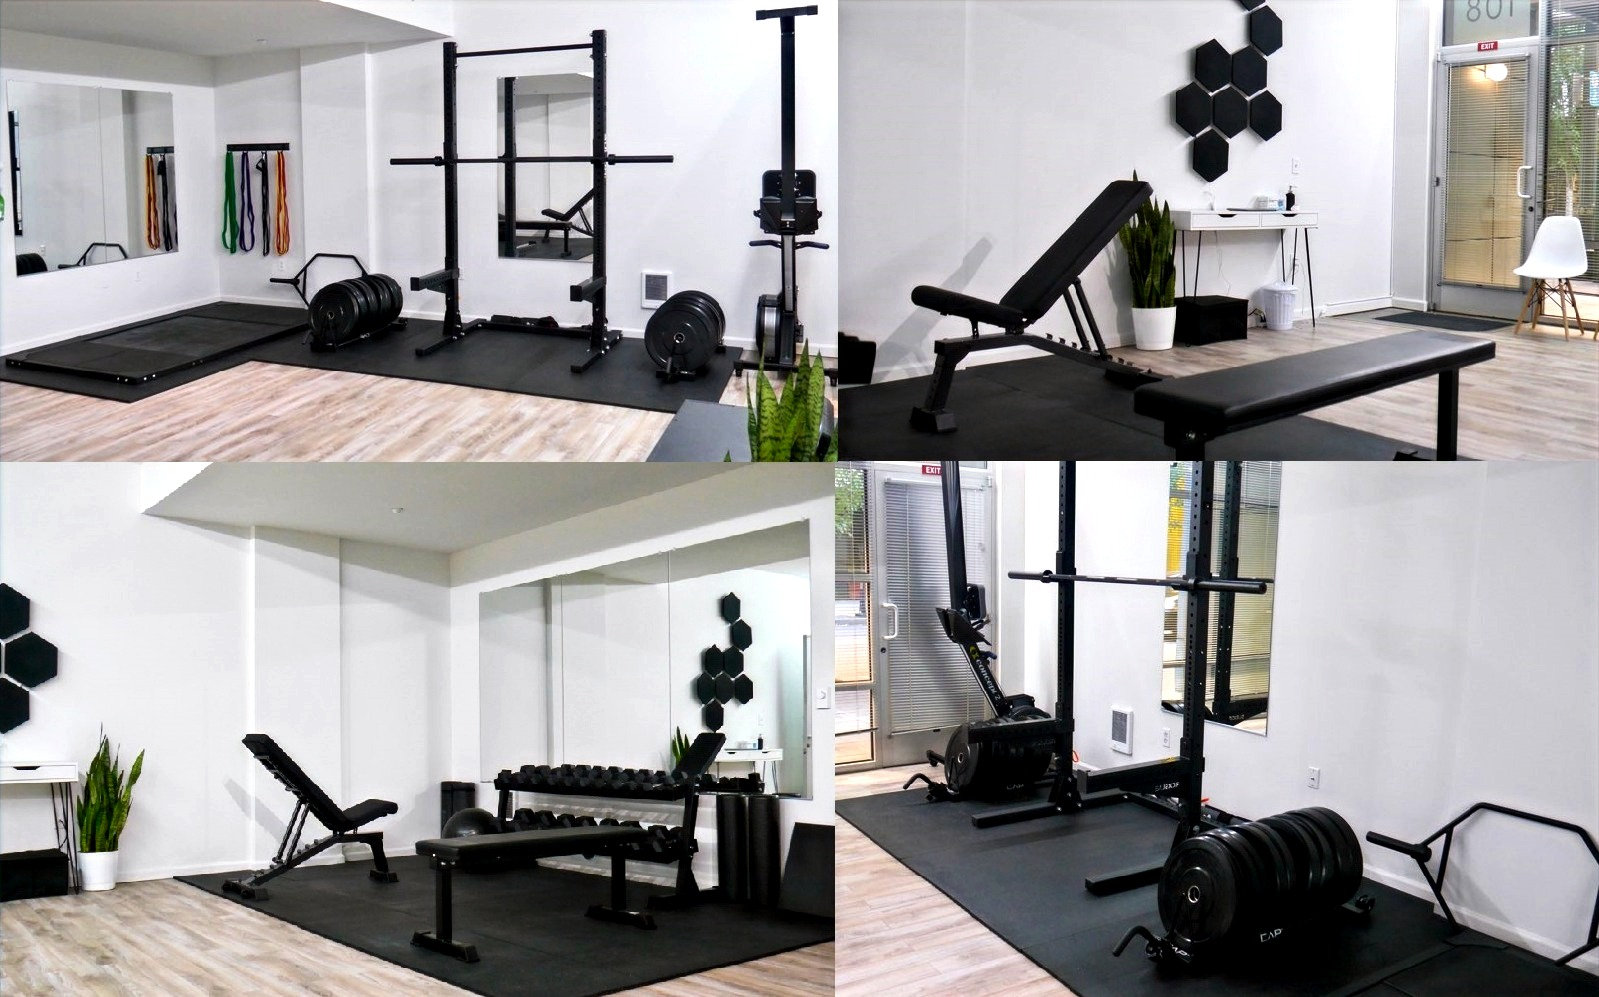 JohnstonFit Training Studio